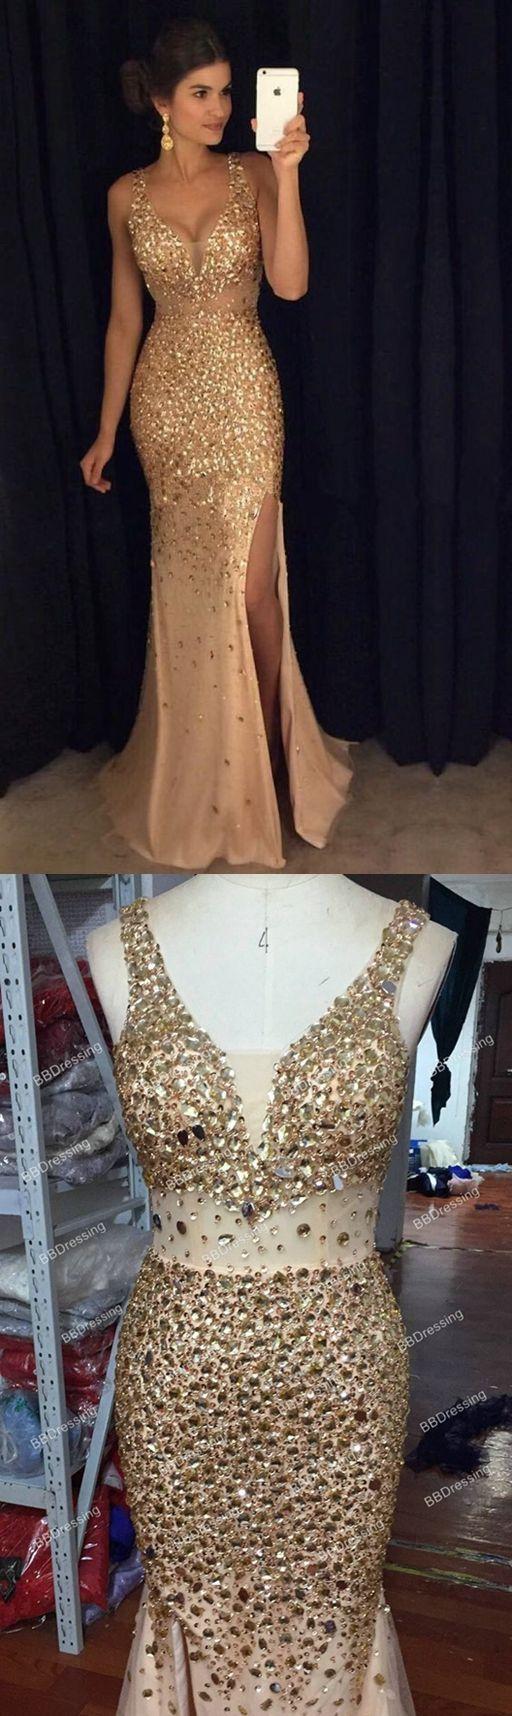 Gold rhinestone beaded mermaid evening prom dresses sexy see